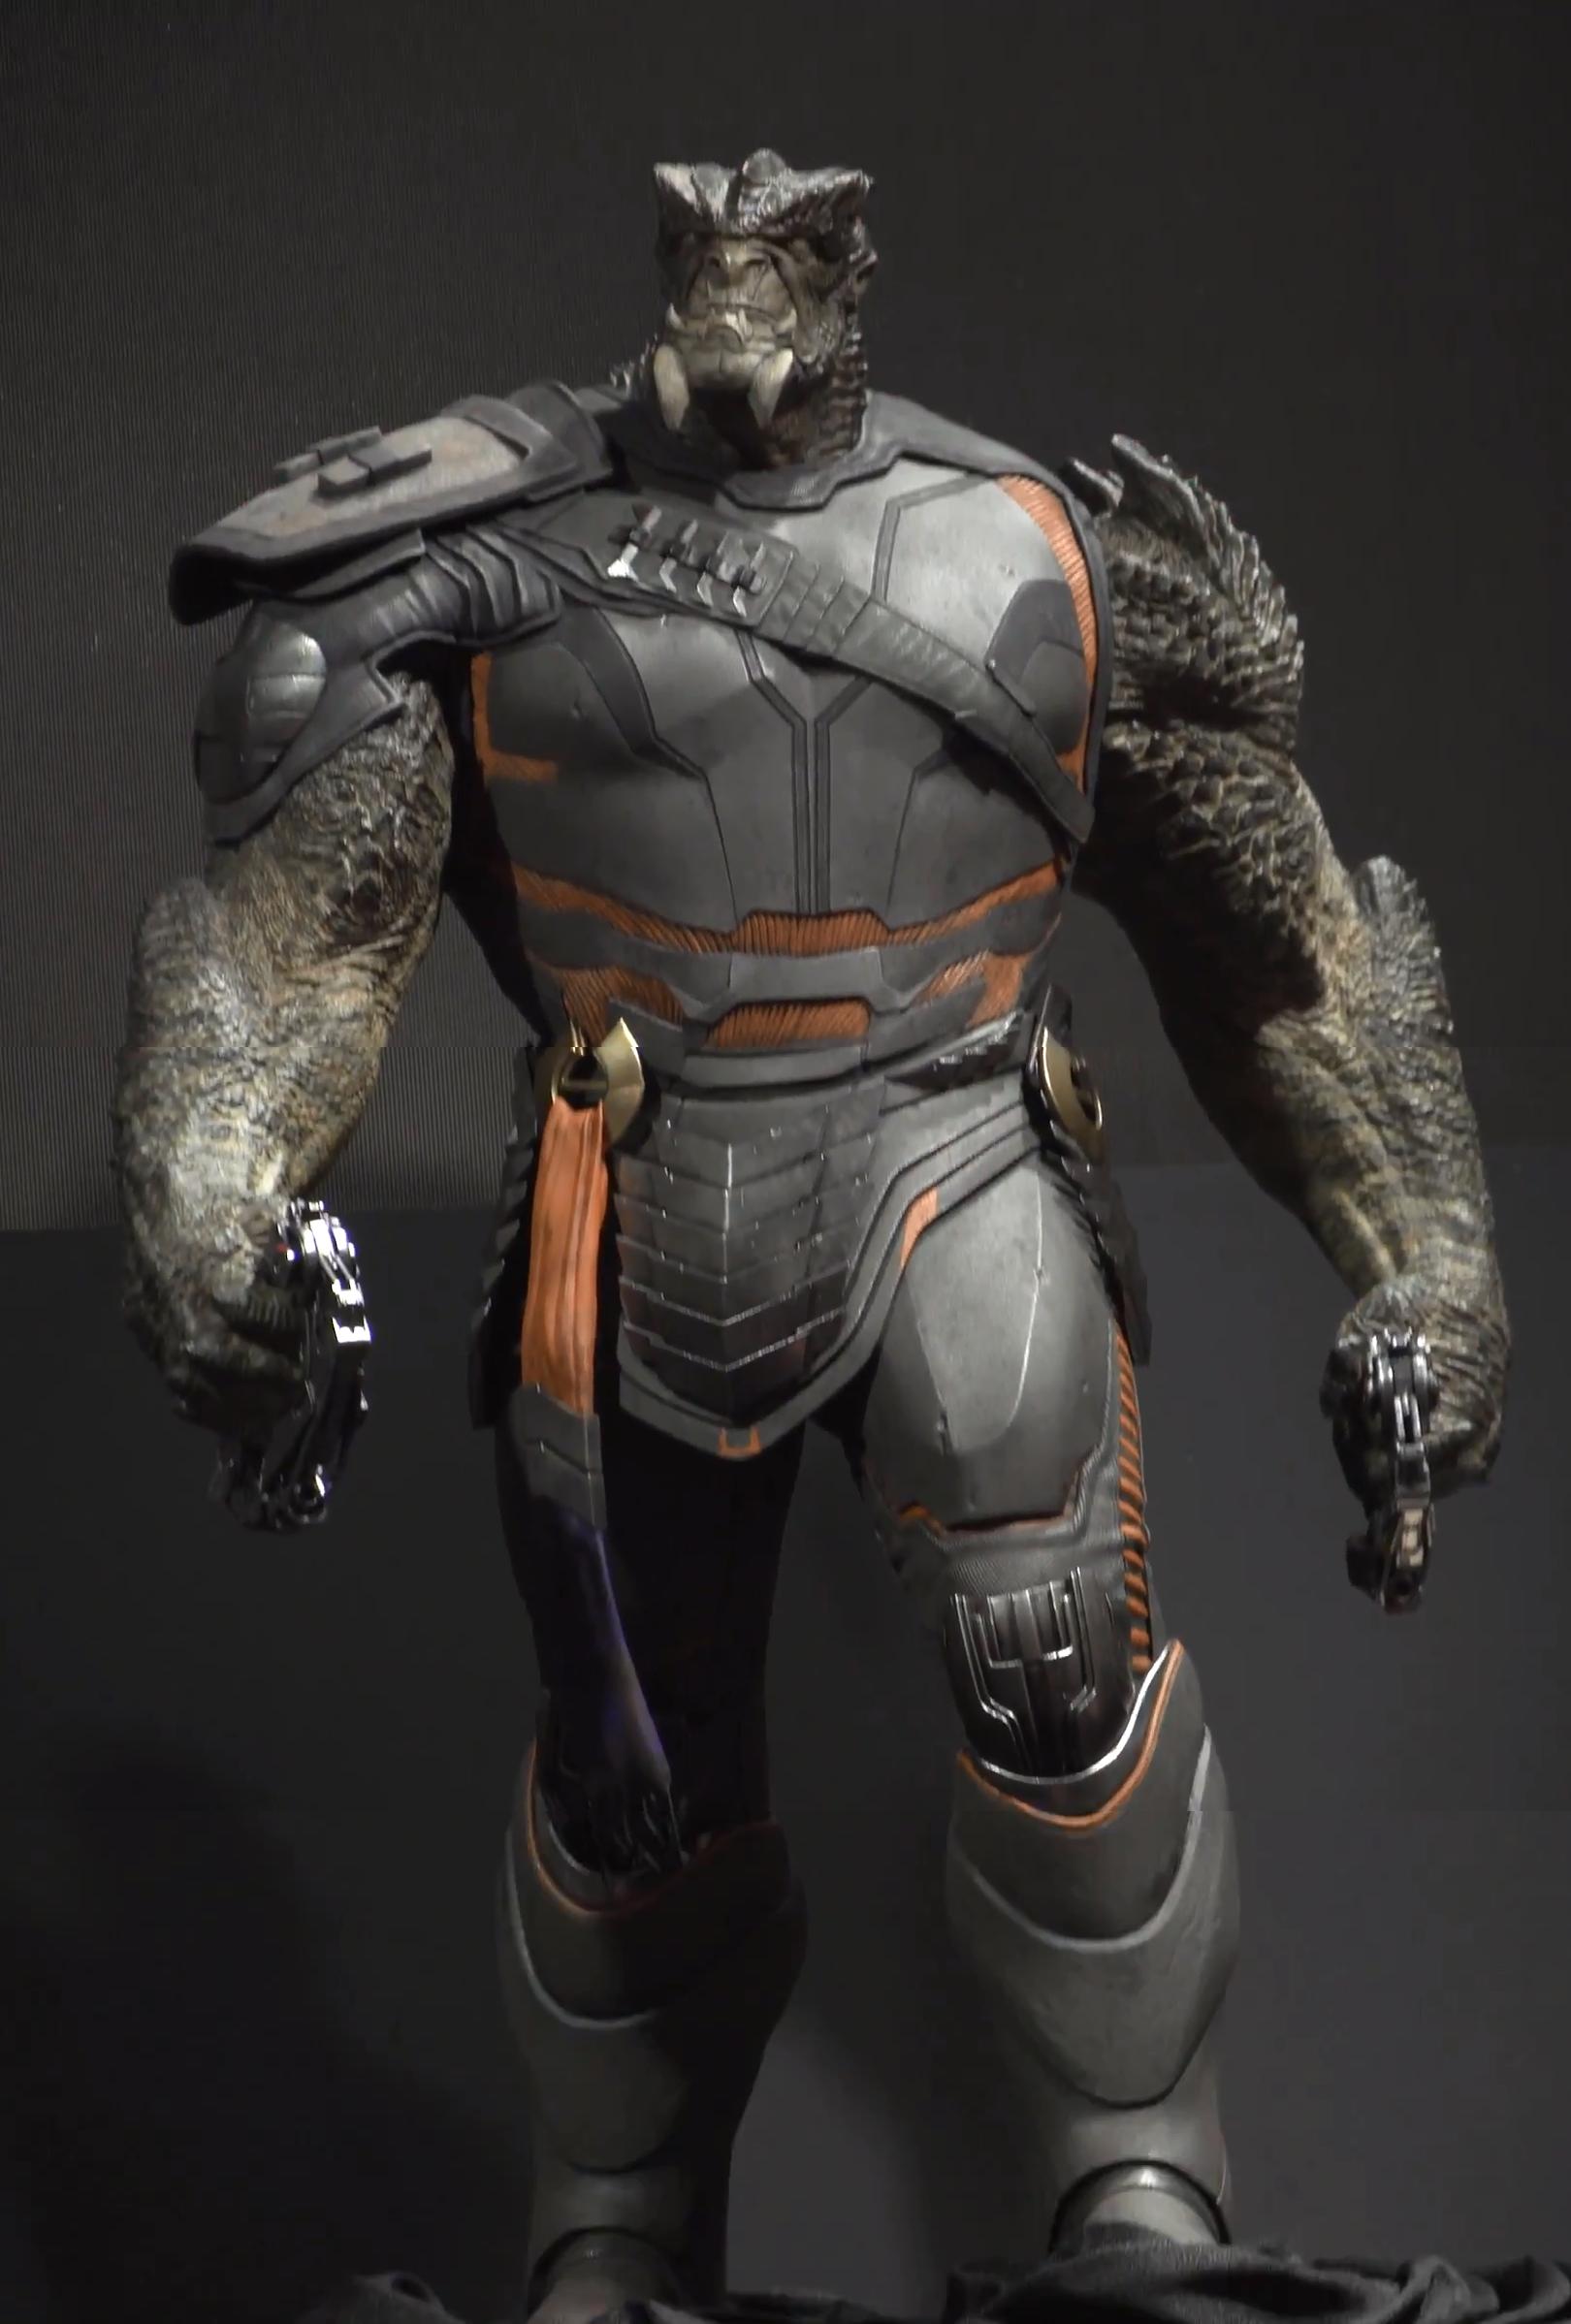 cull obsidian marvel cinematic universe wiki fandom